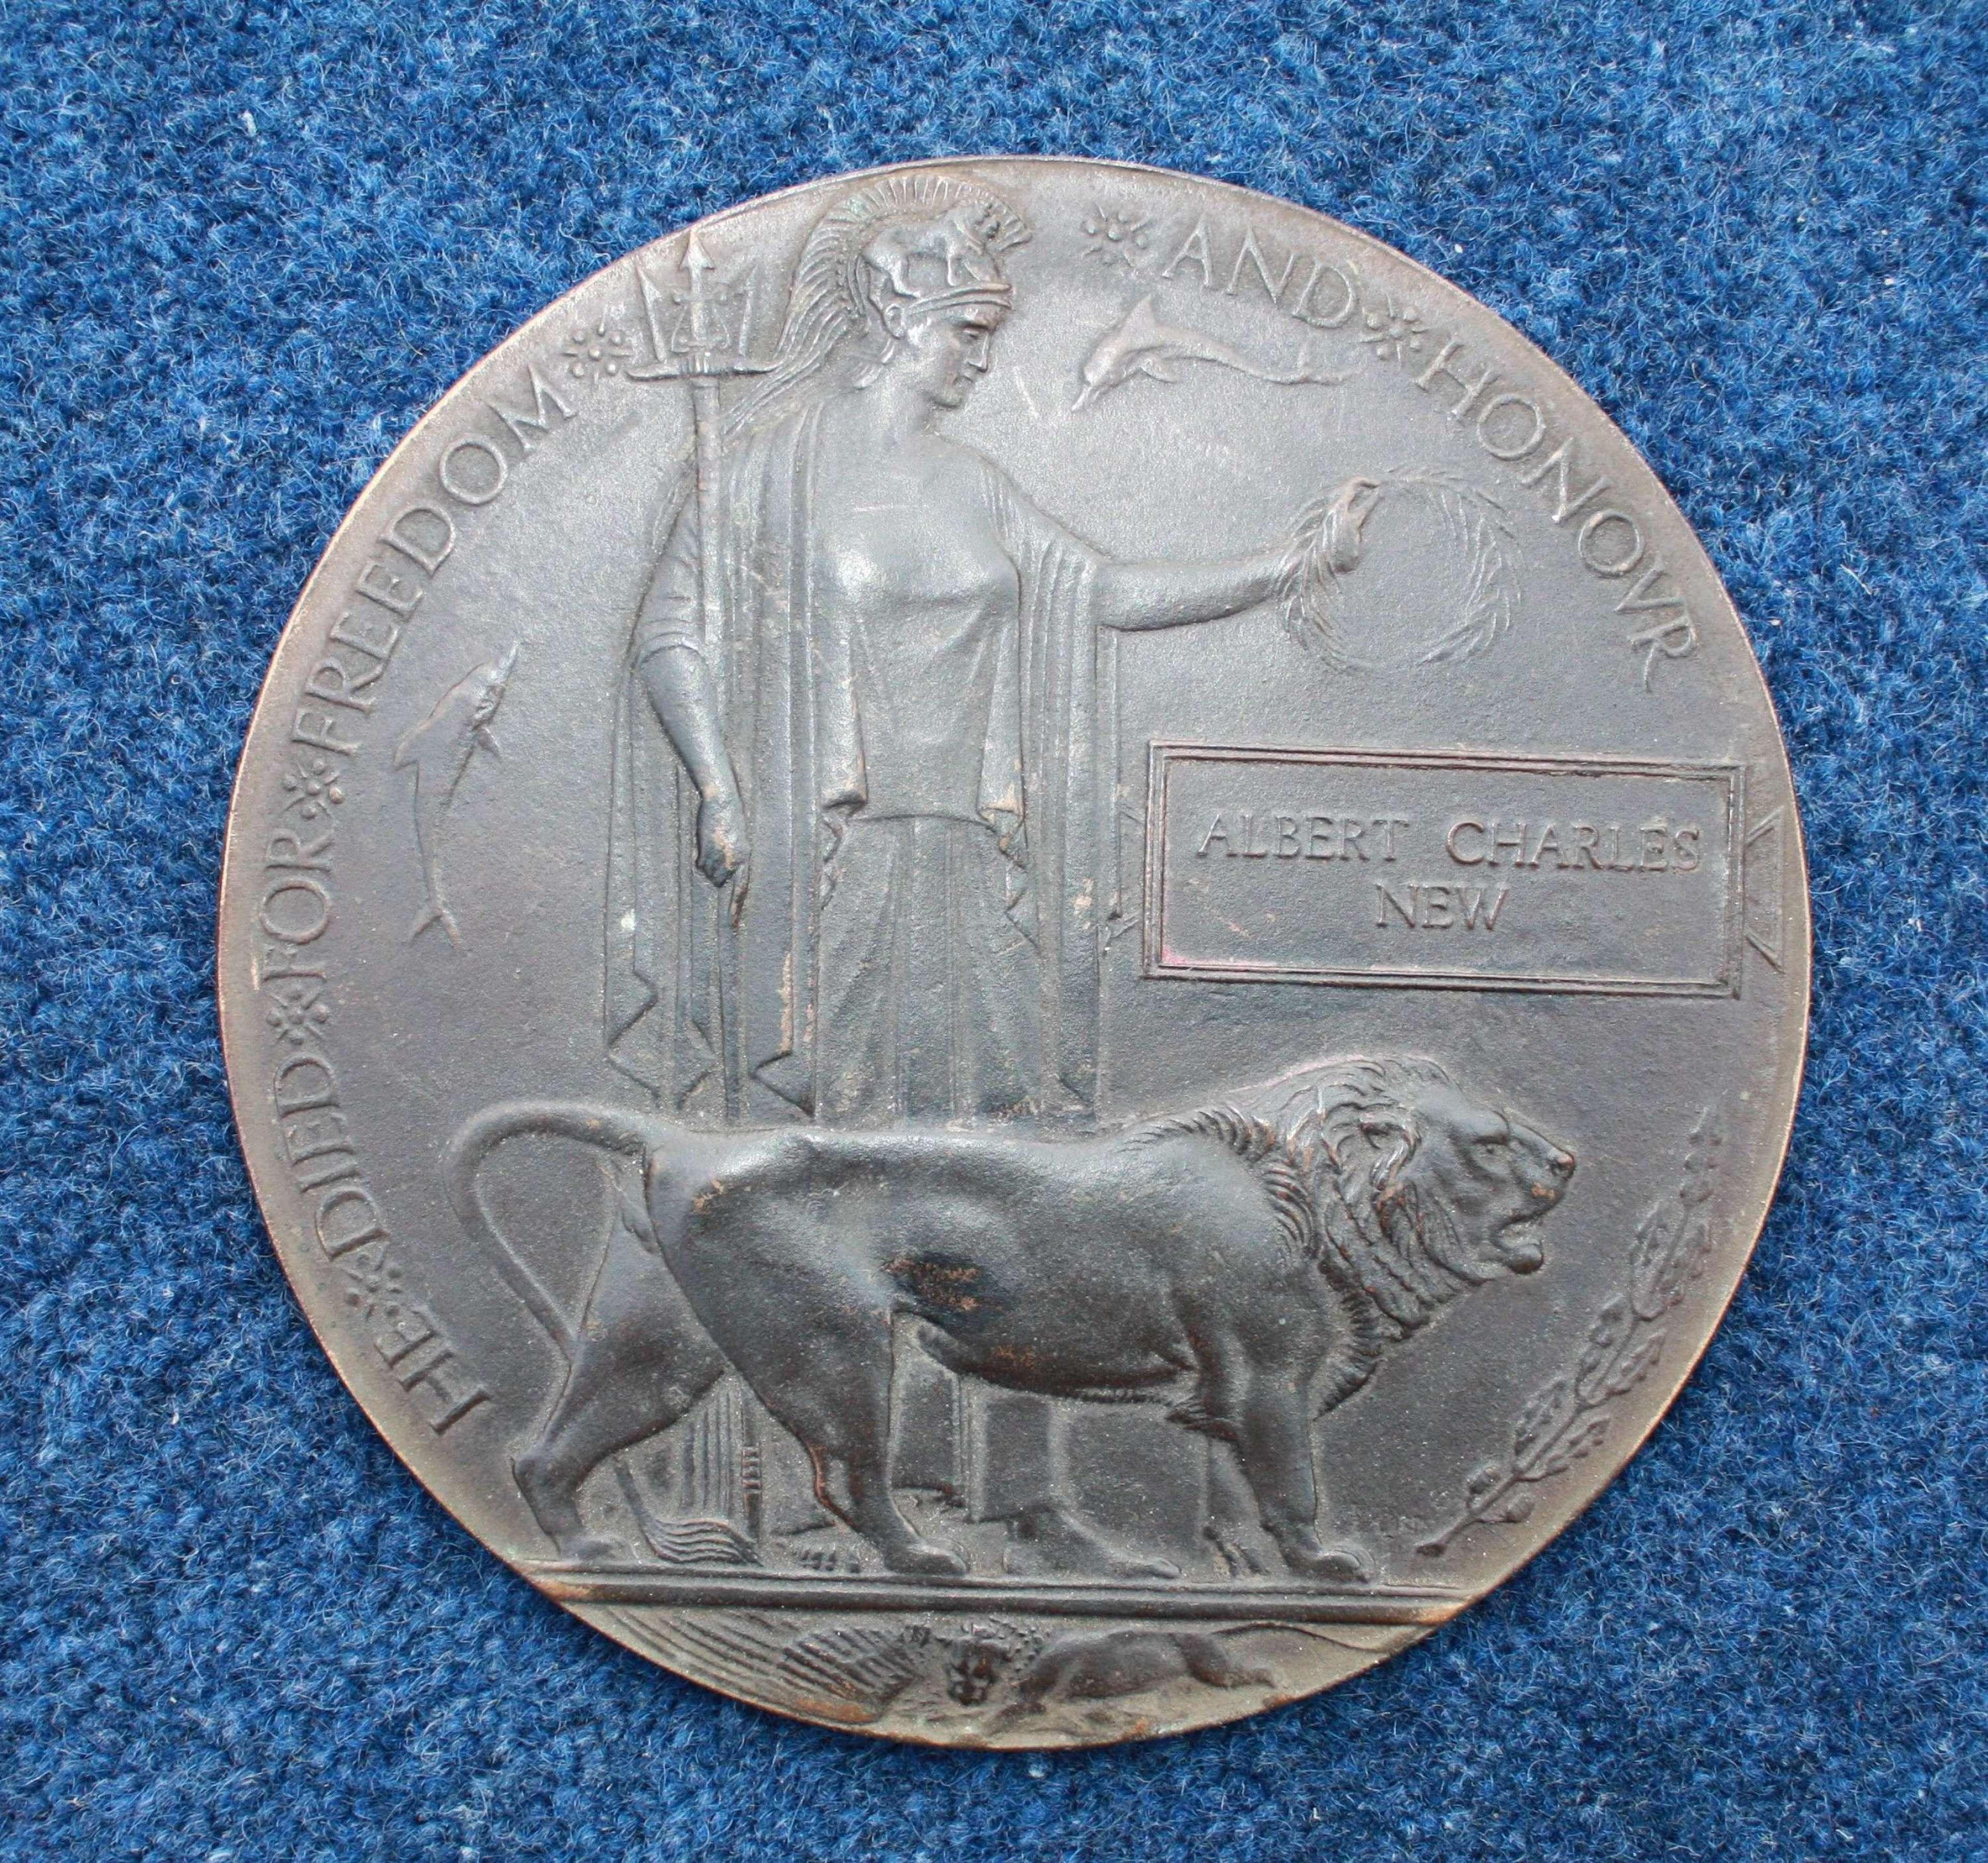 WW1 Death Plaque Royal Munster Fusiliers 1915 Gallipoli